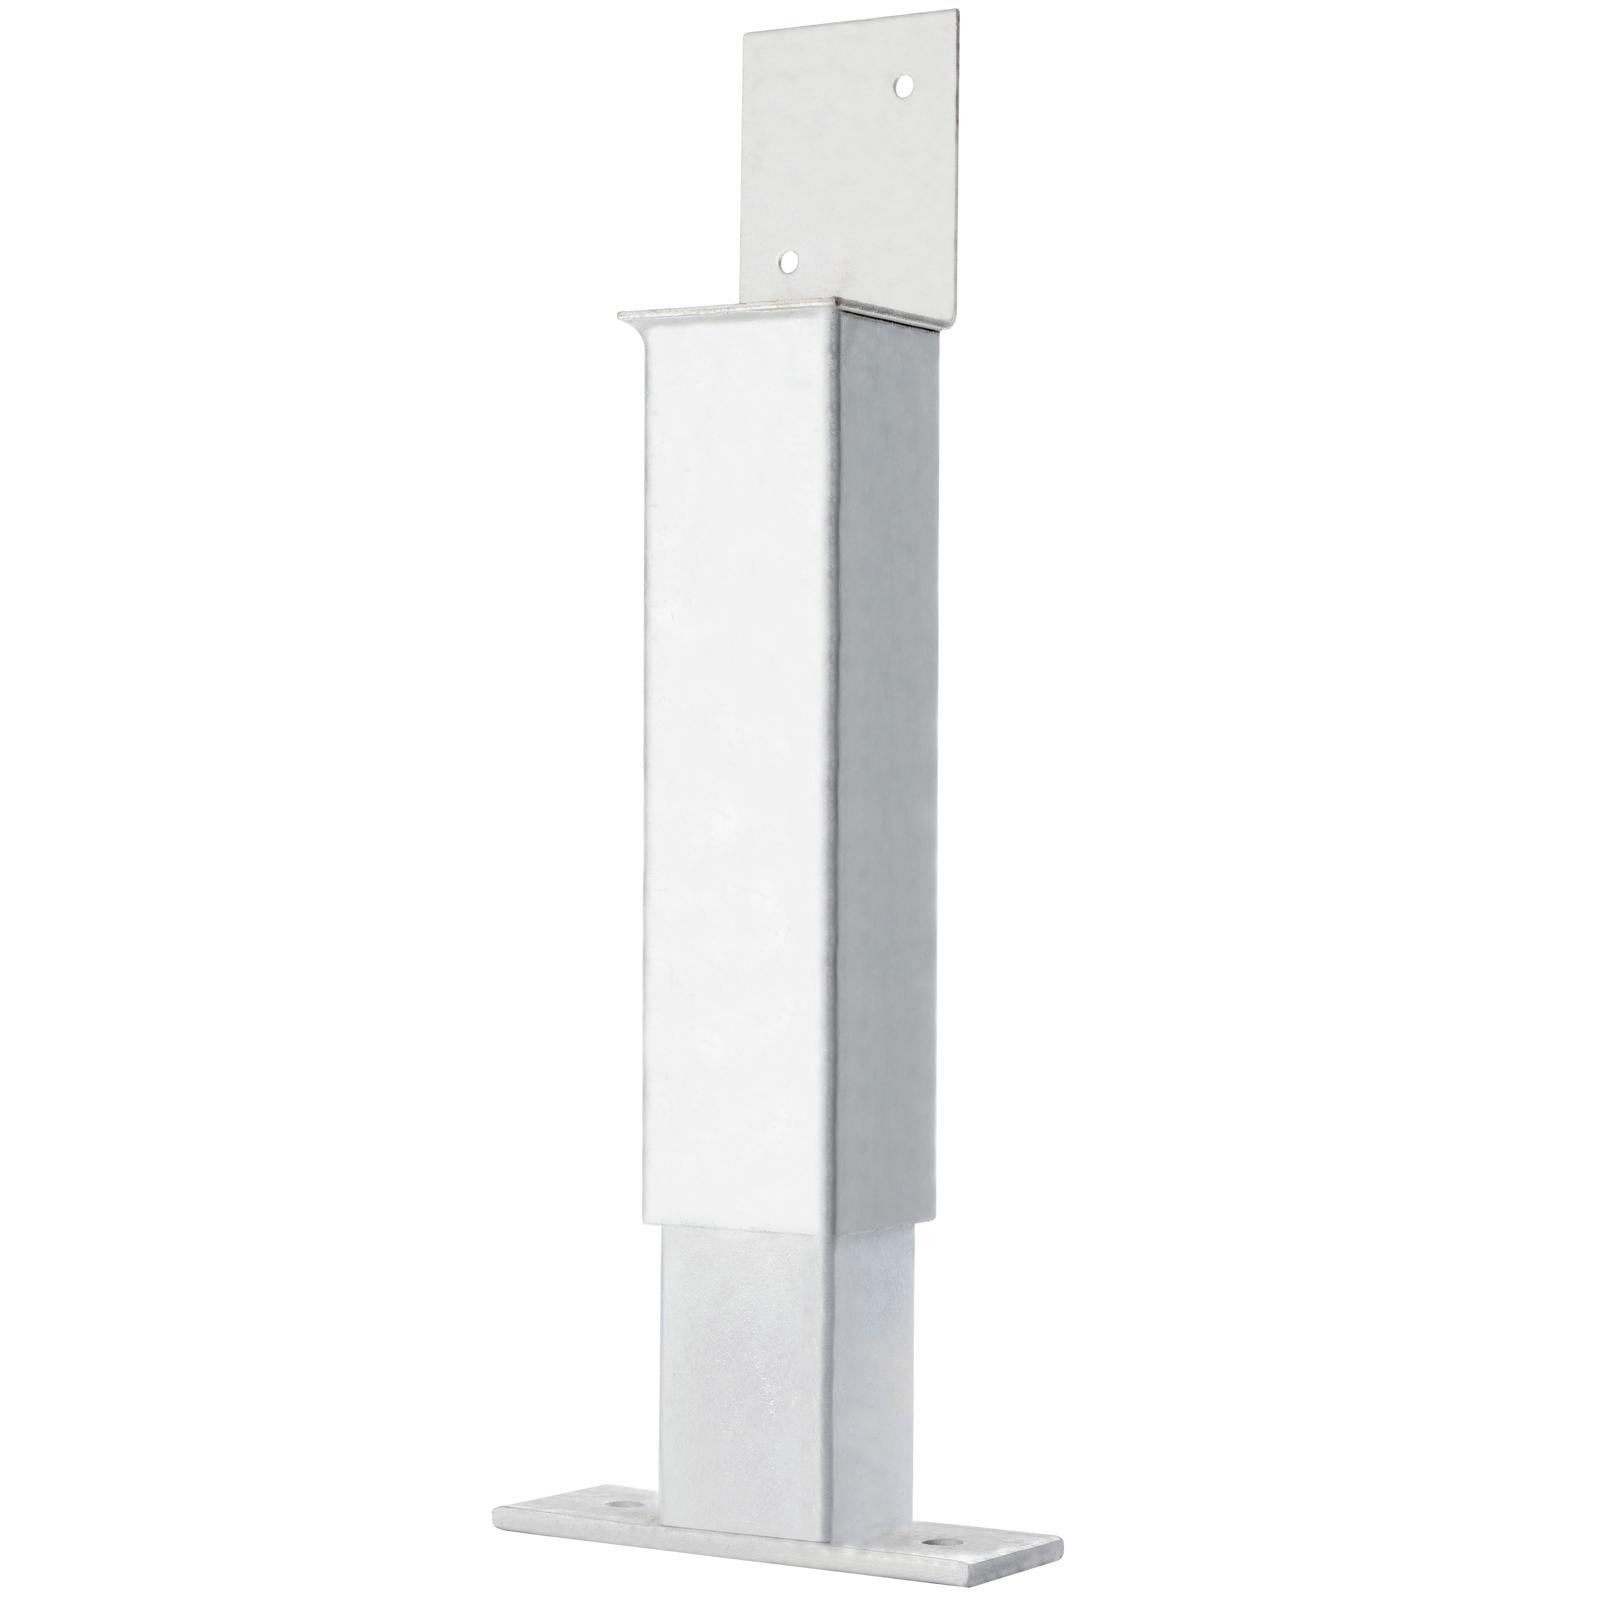 Uni-Pier 65 x 65 x 200mm Post With Head Without Antcap